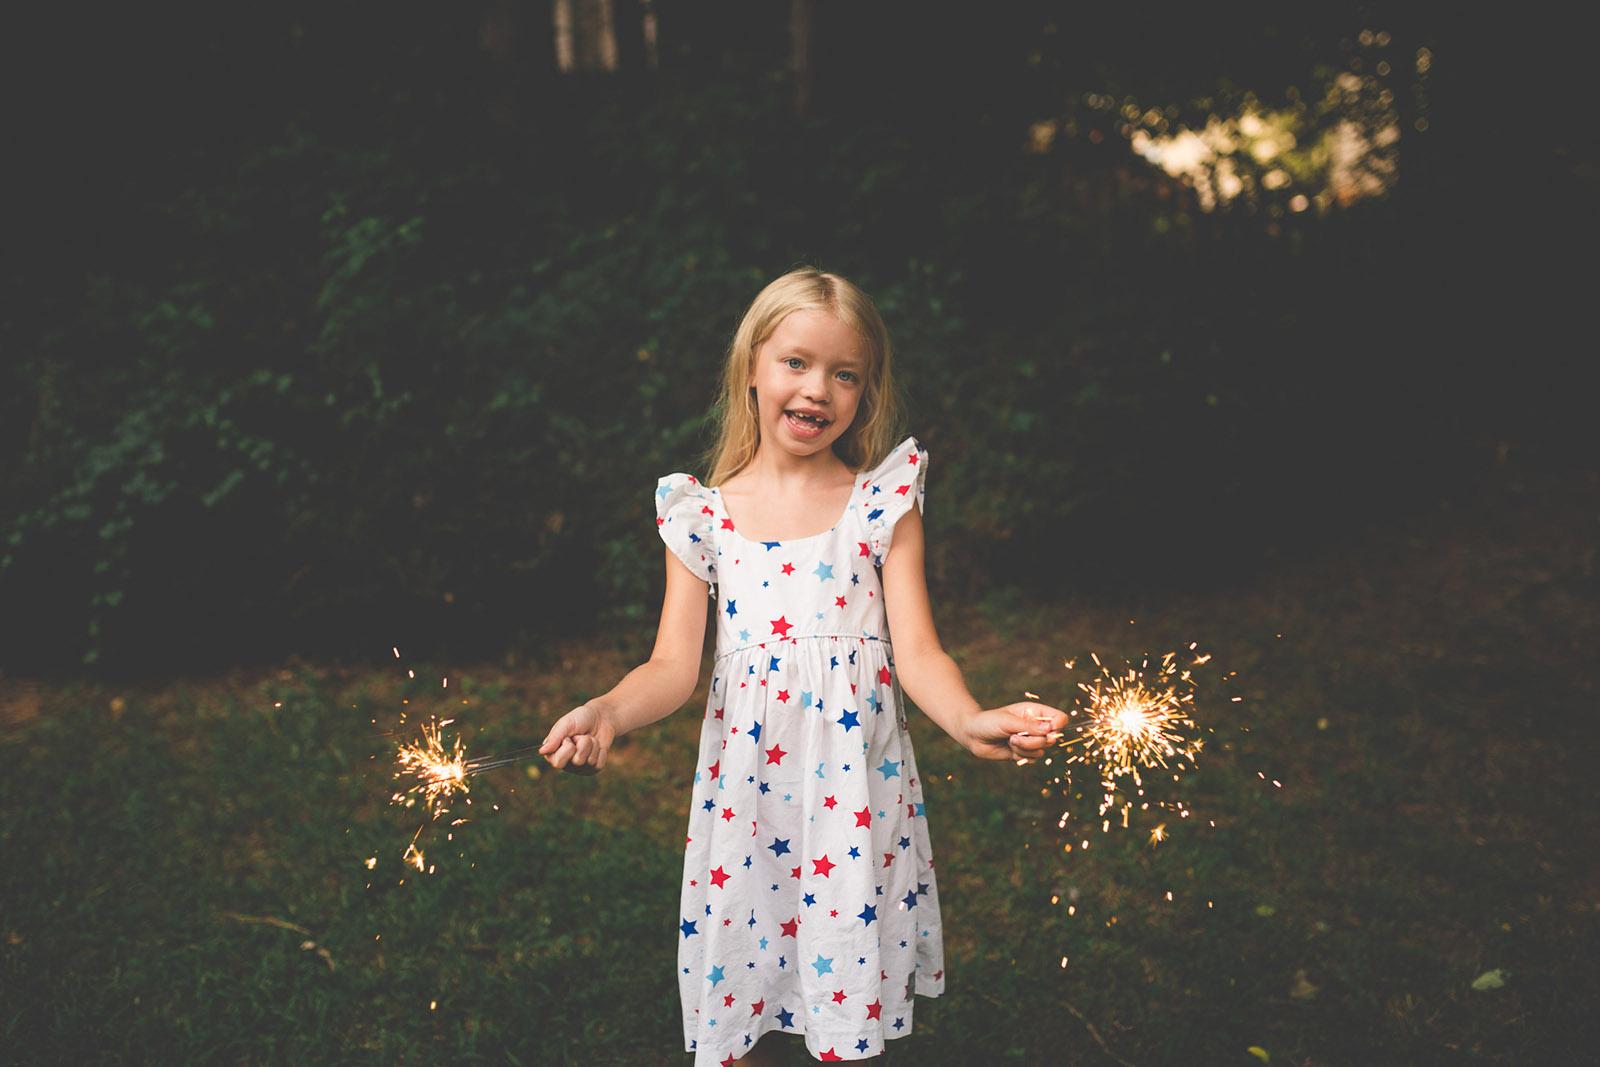 sparkler safety by Tiffany Kelly